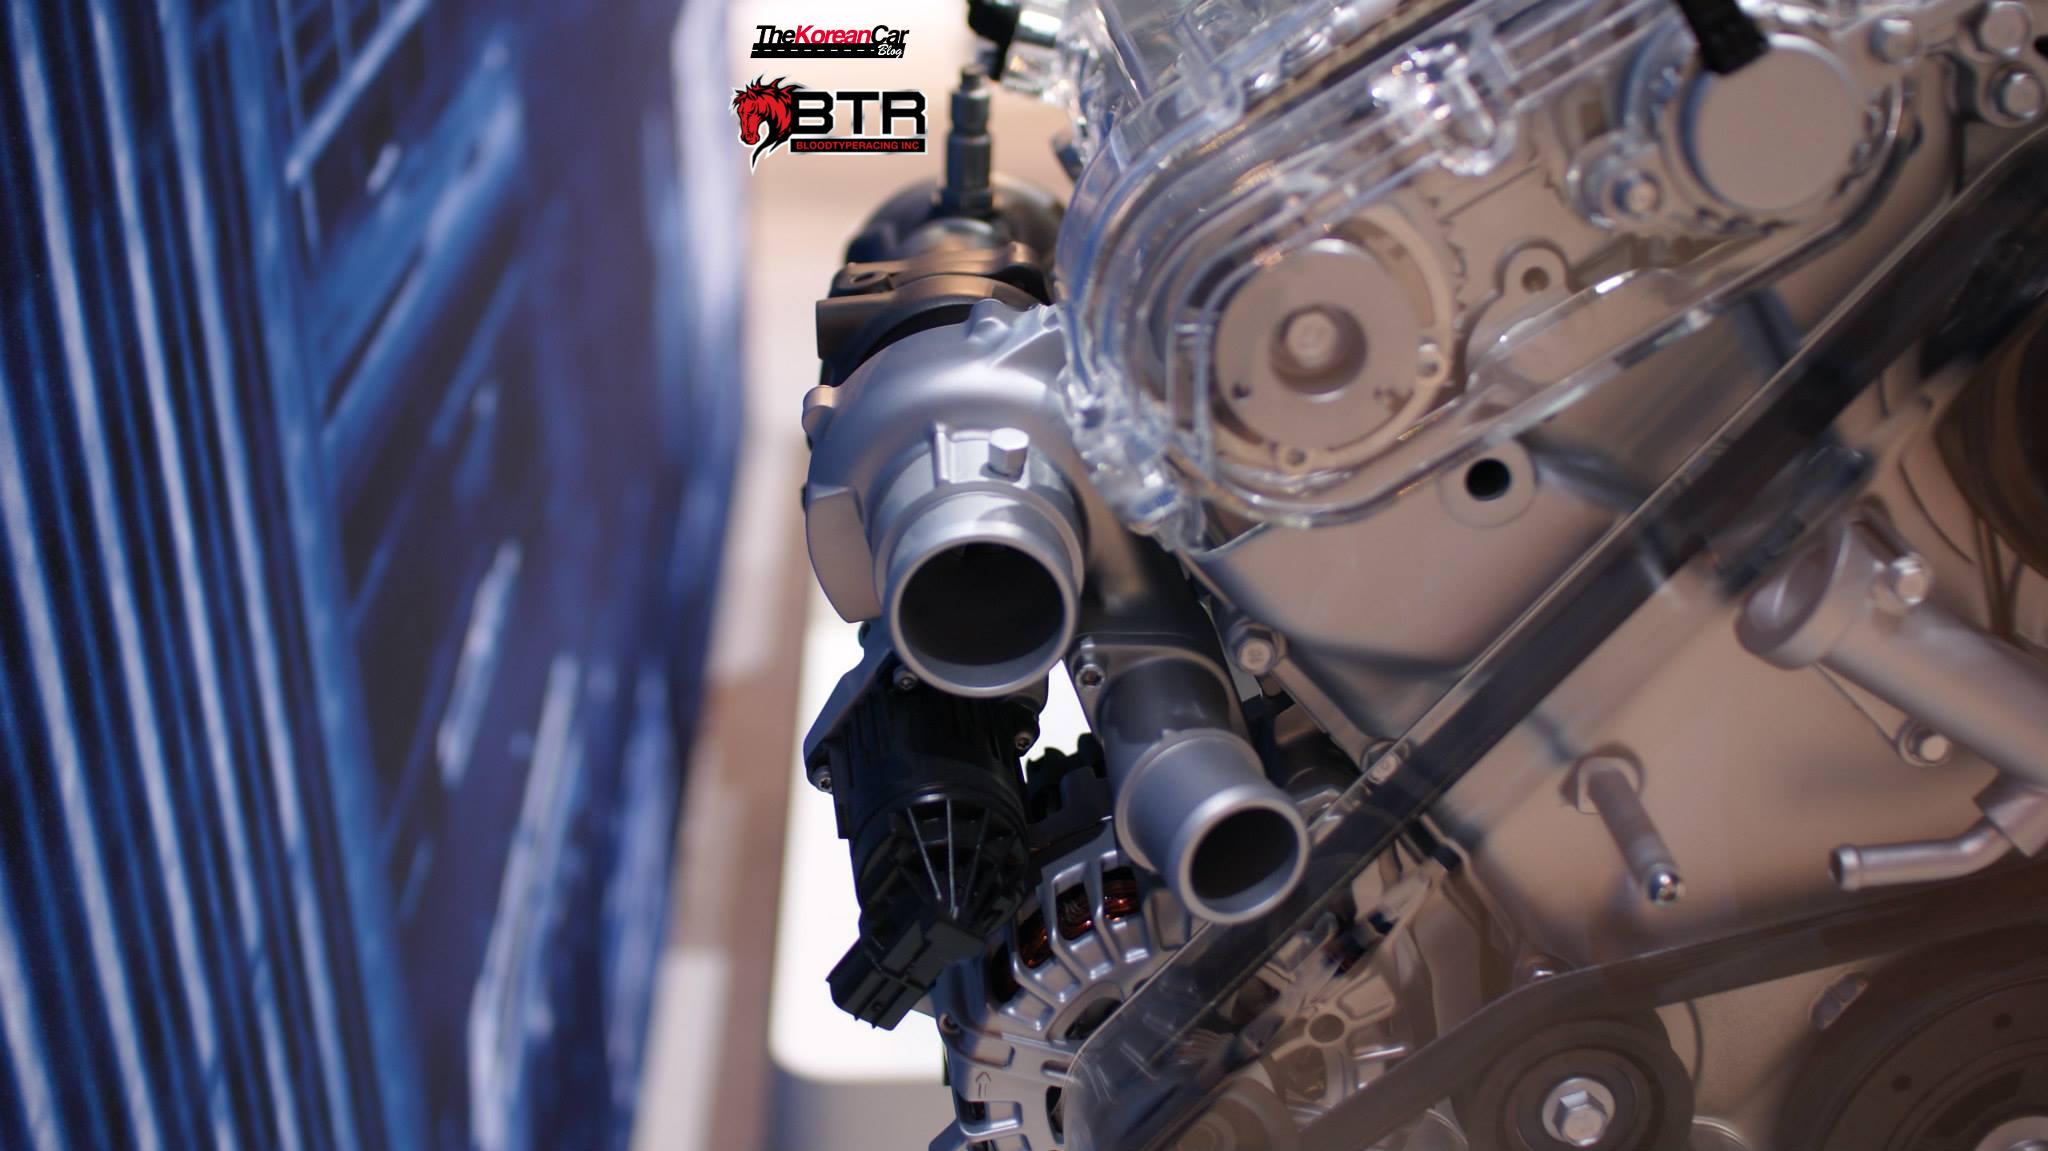 Hyundai Turbo Engine Diagram Wiring Libraries Gdi Exclusive 3 V6 Korean Car Blog